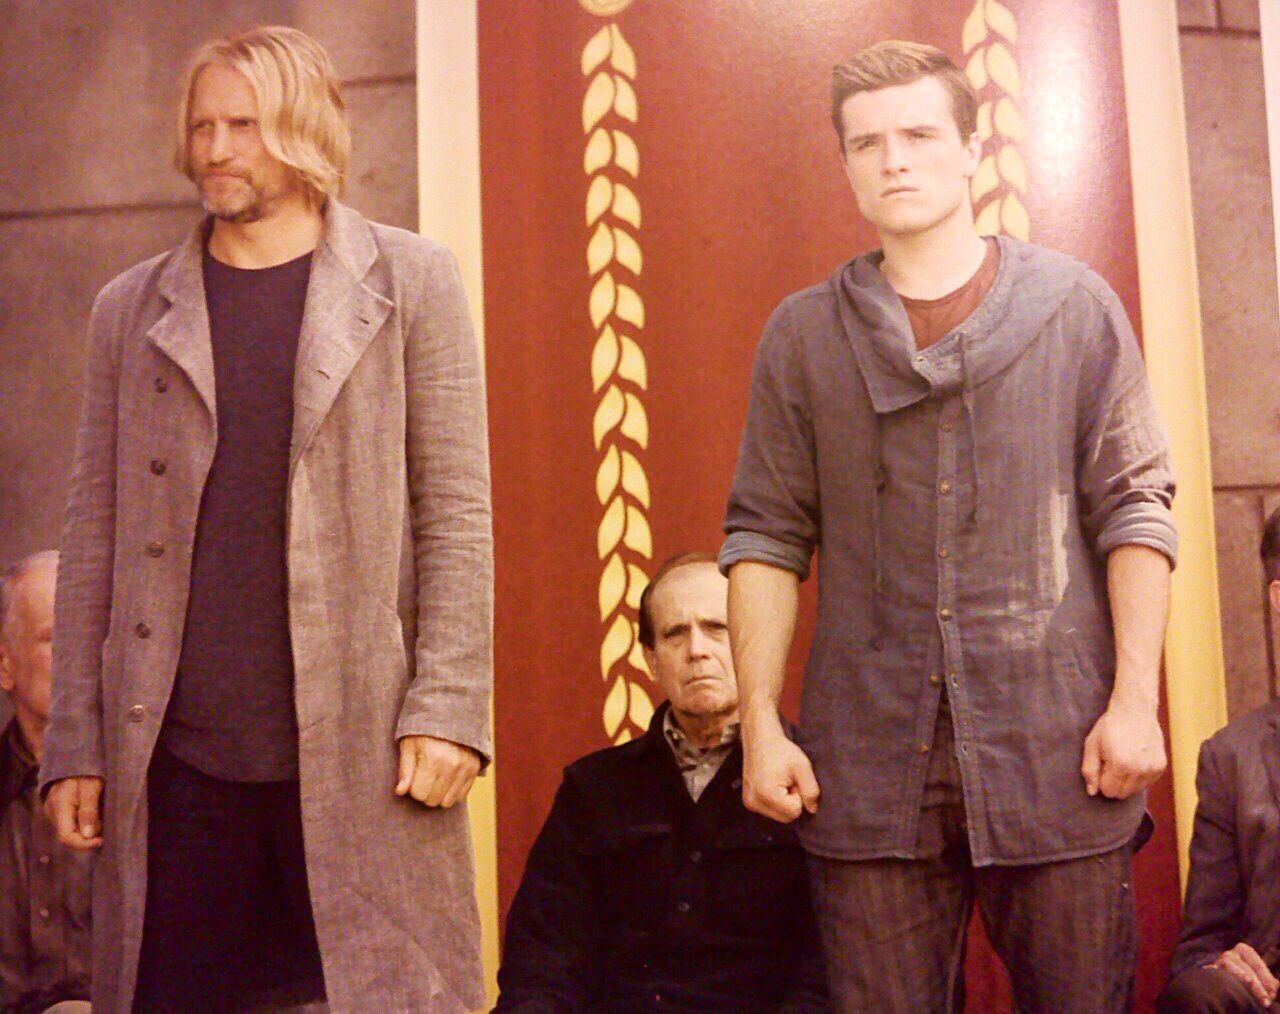 Haymitch and peeta